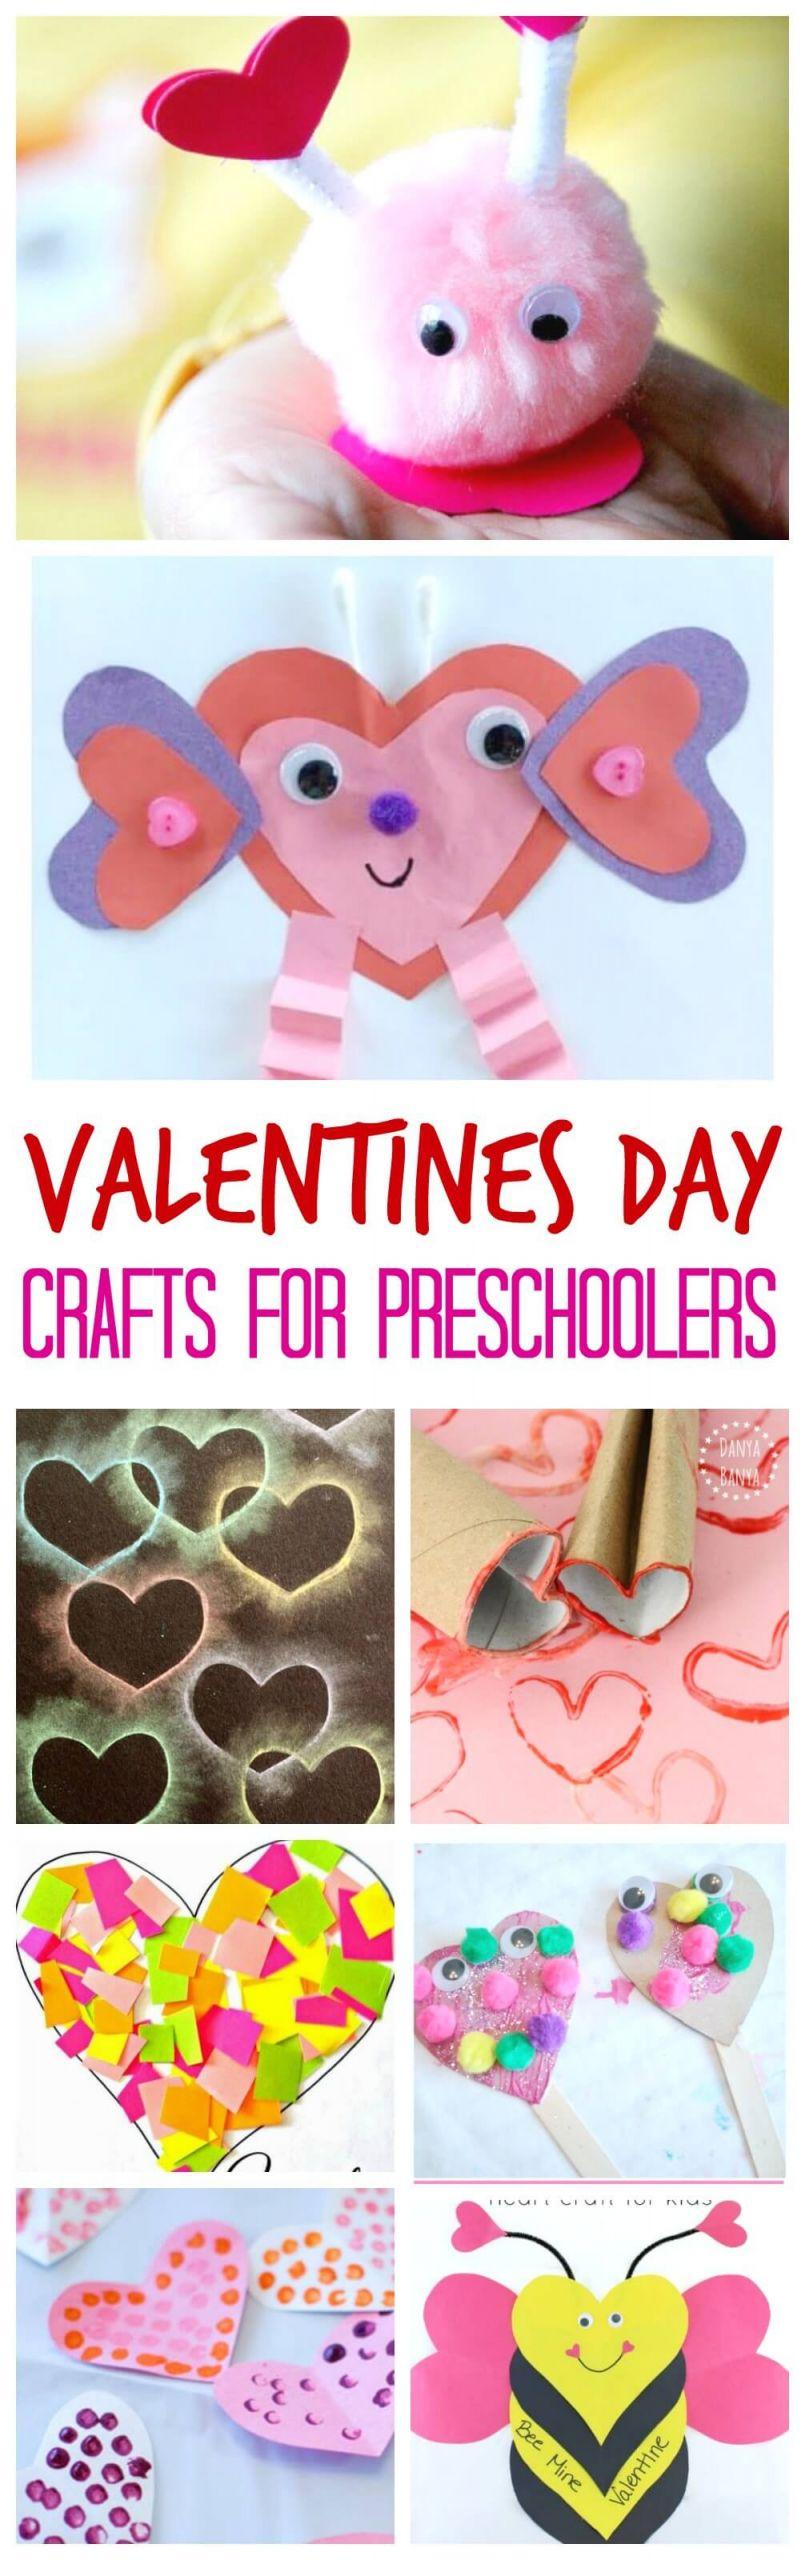 Valentine'S Day Craft Ideas For Preschoolers  Valentine s Day Crafts for Preschoolers